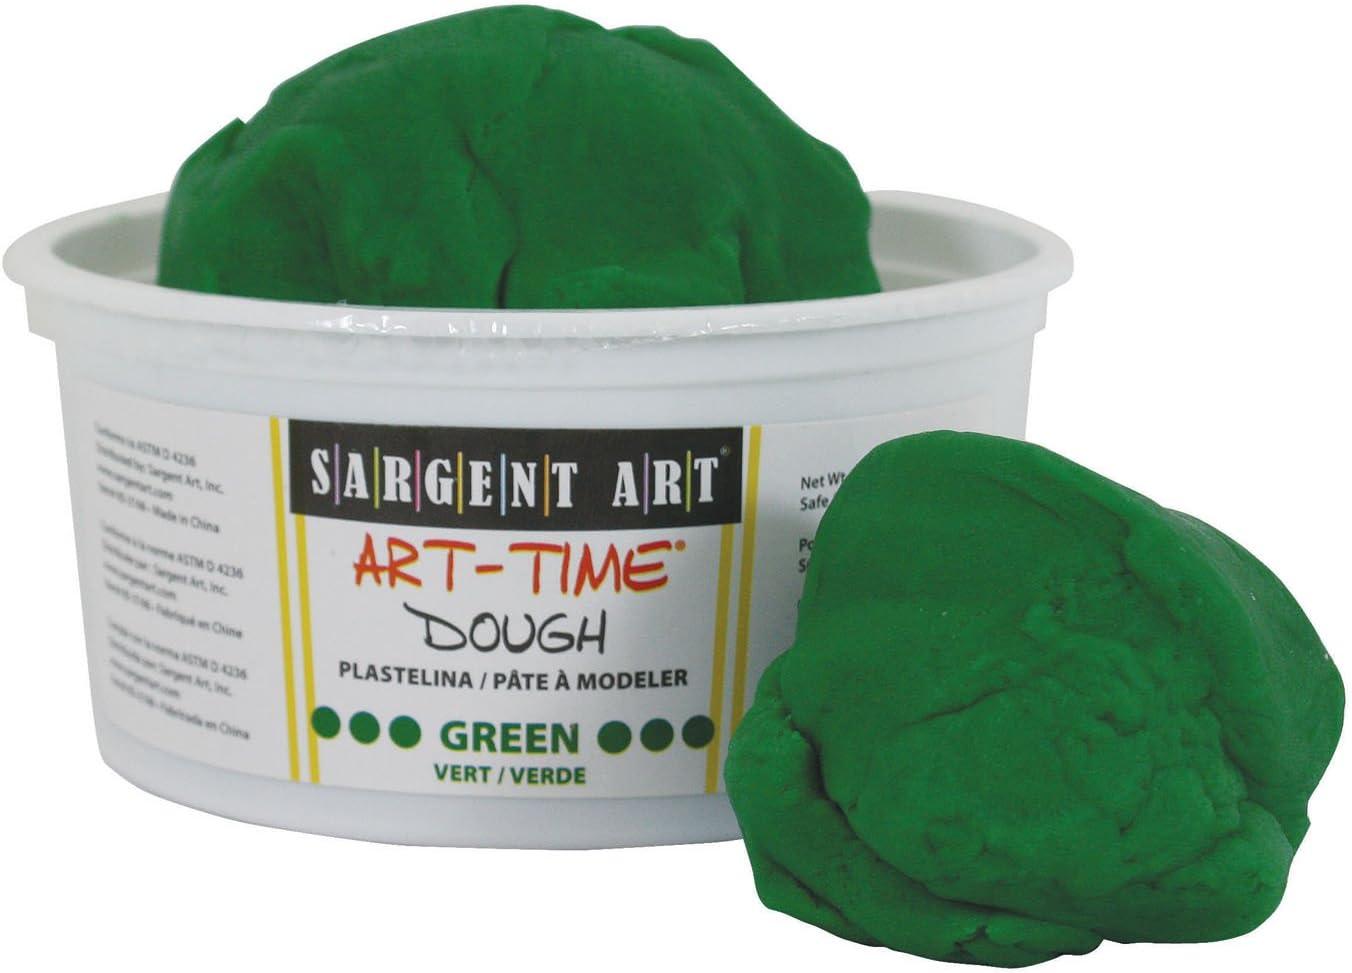 Sargent Art 85-3366 3-Pound Art-Time Dough Green